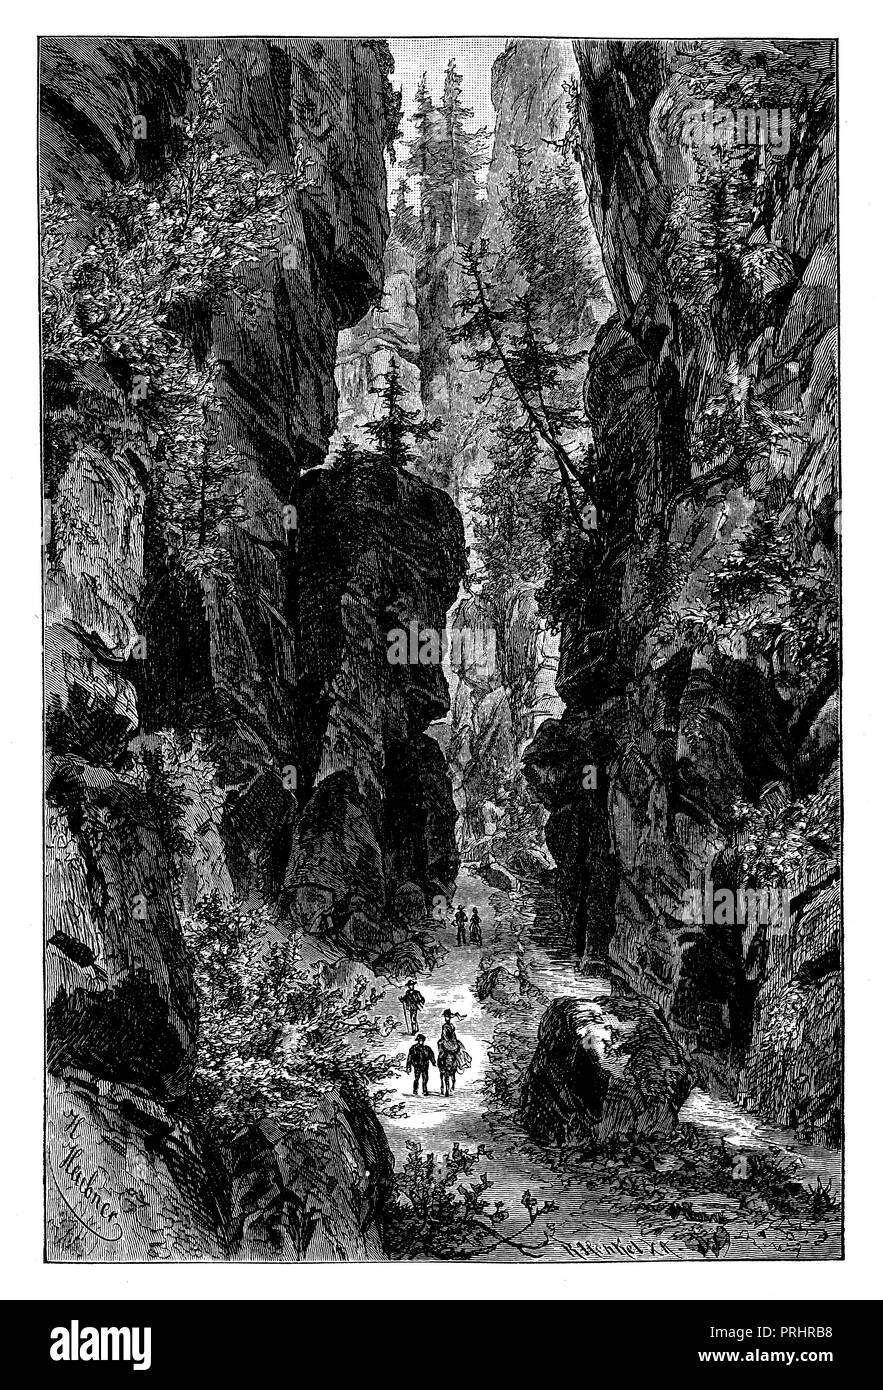 Uttewalder Grund in the Elbsandsteingebirge,   1887 - Stock Image